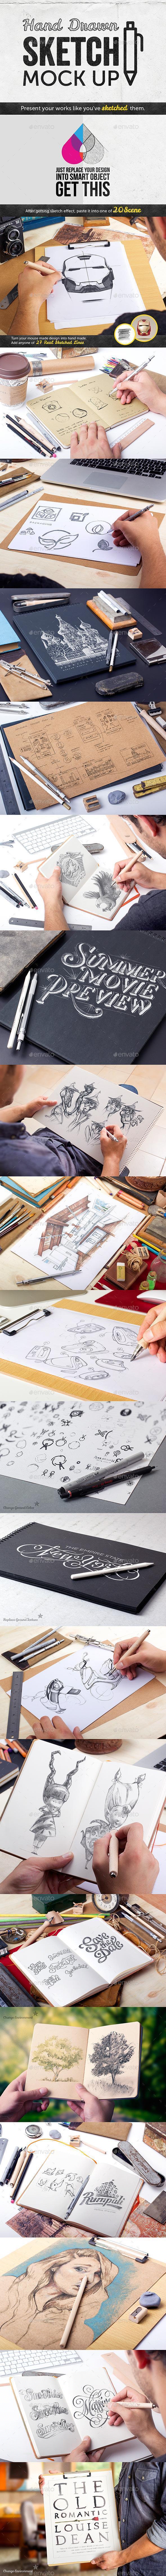 Creative Hand Drawn Sketch Mockup